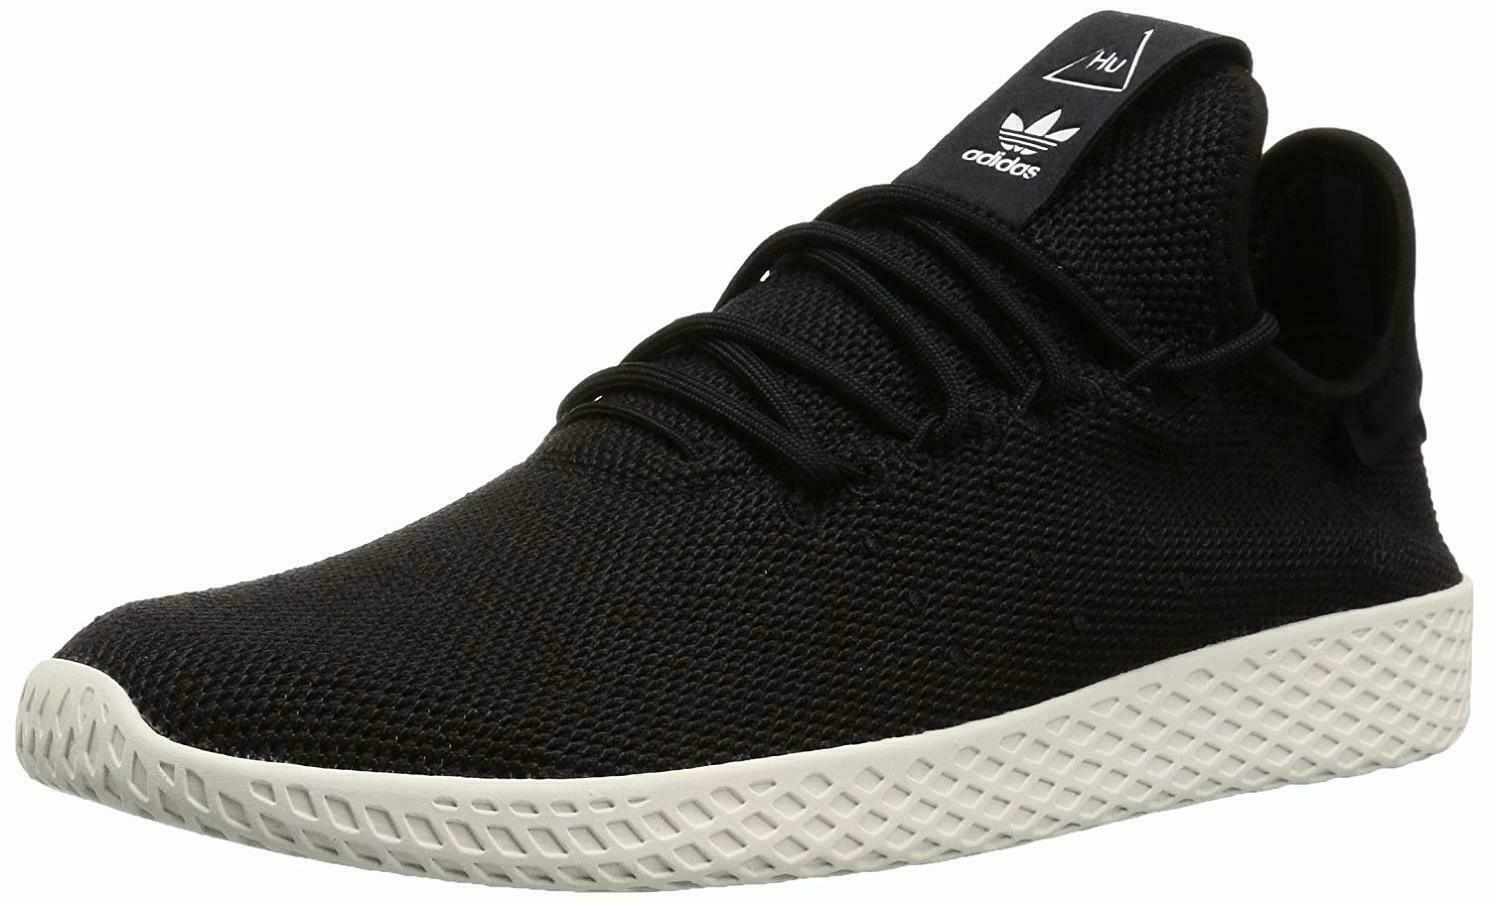 Adidas Men's Pharrell Williams HU Tennis shoes - Choose SZ color